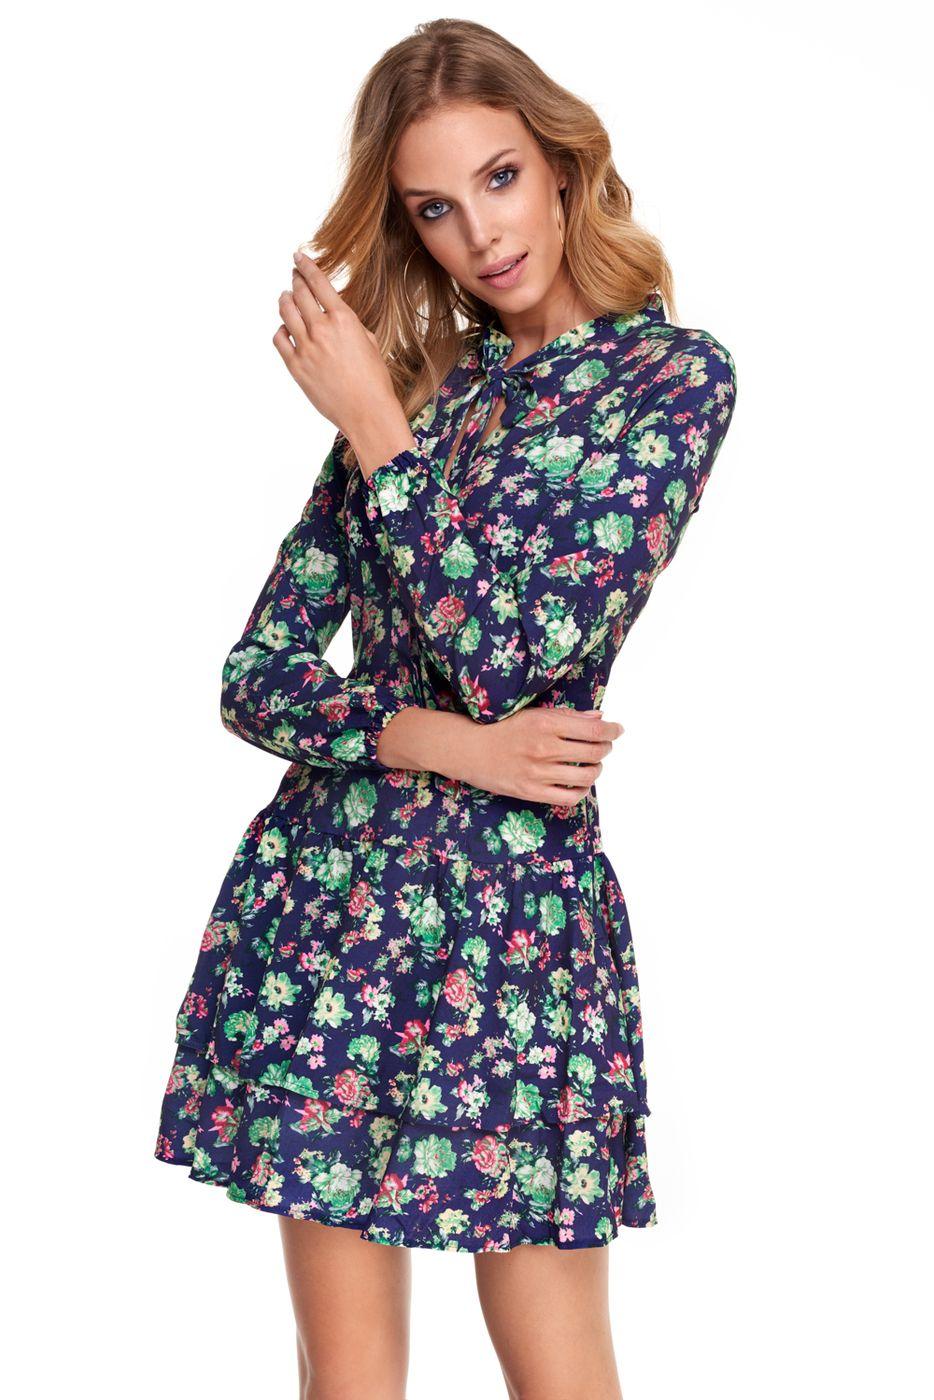 J2018 Sukienka Betty Granatowa W Kwiaty Dresses Mini Dress Fashion